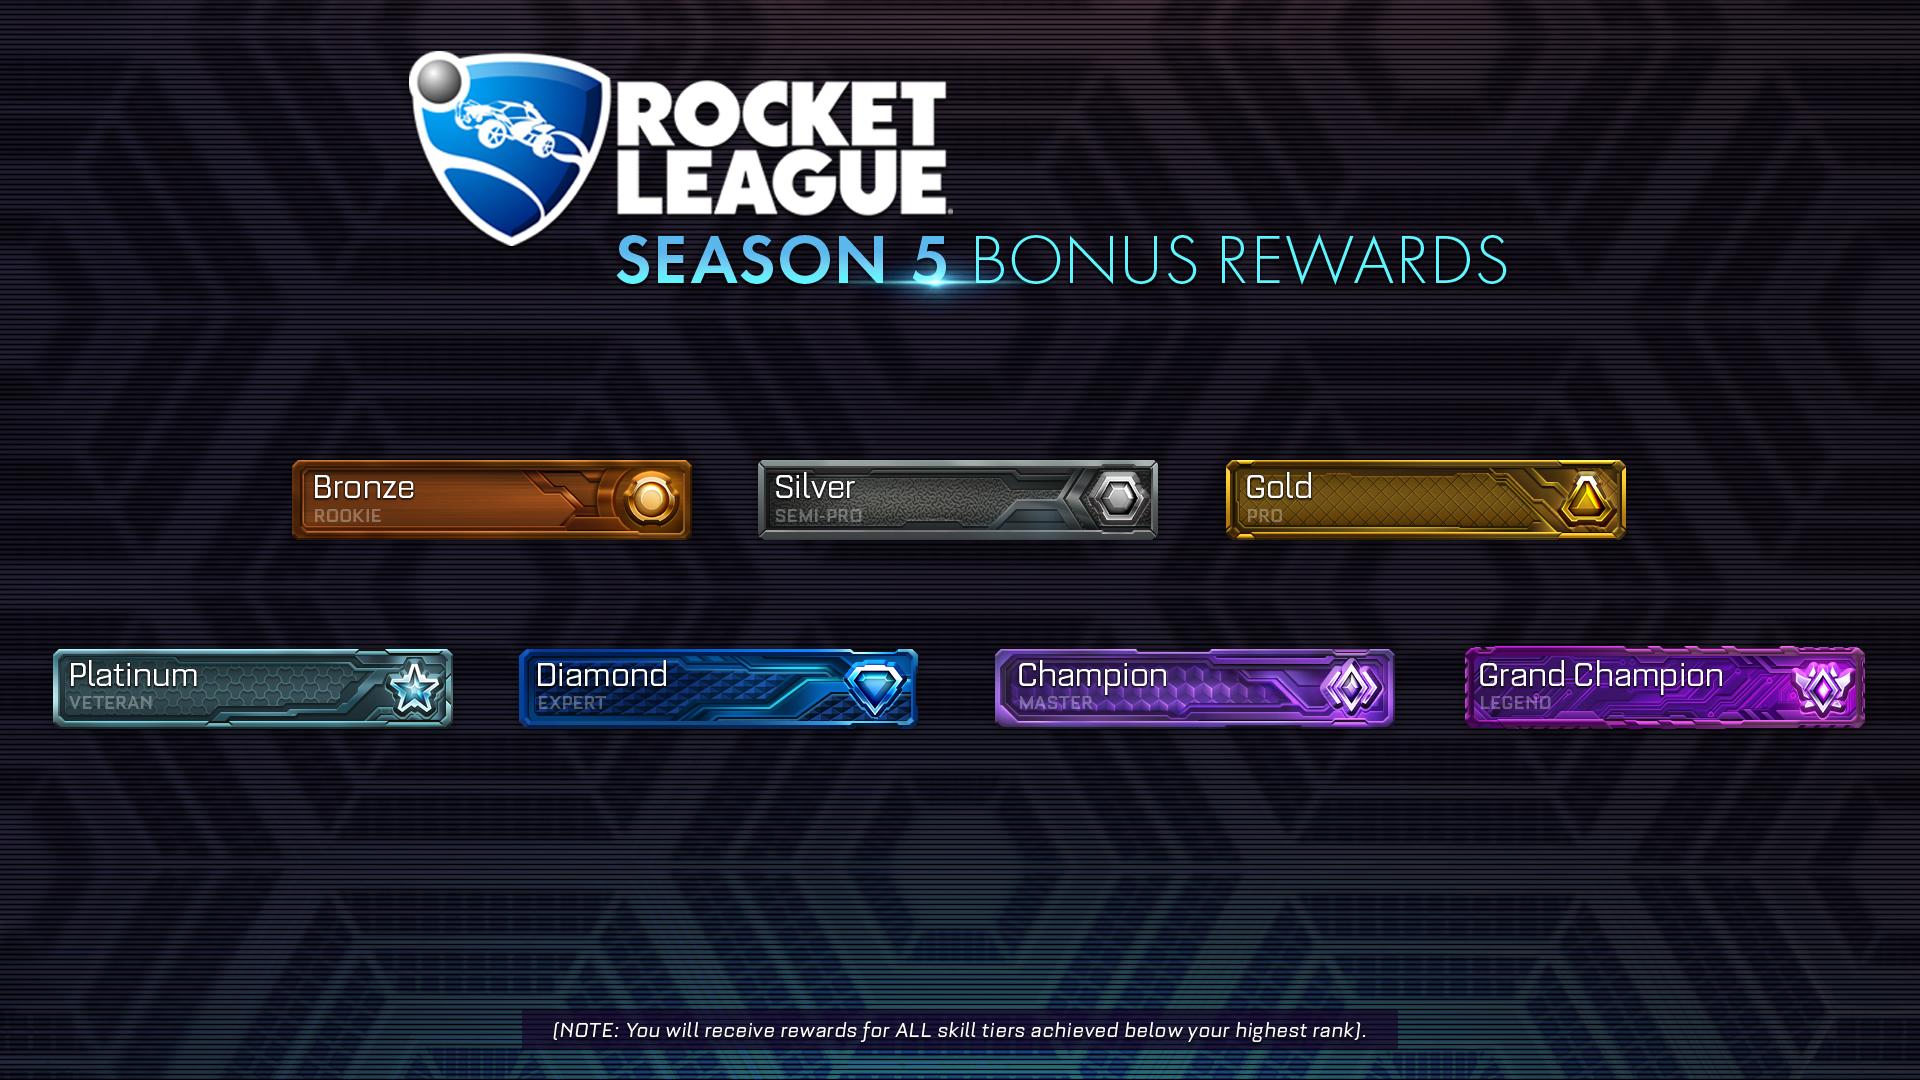 Rocket league matchmaking ranks